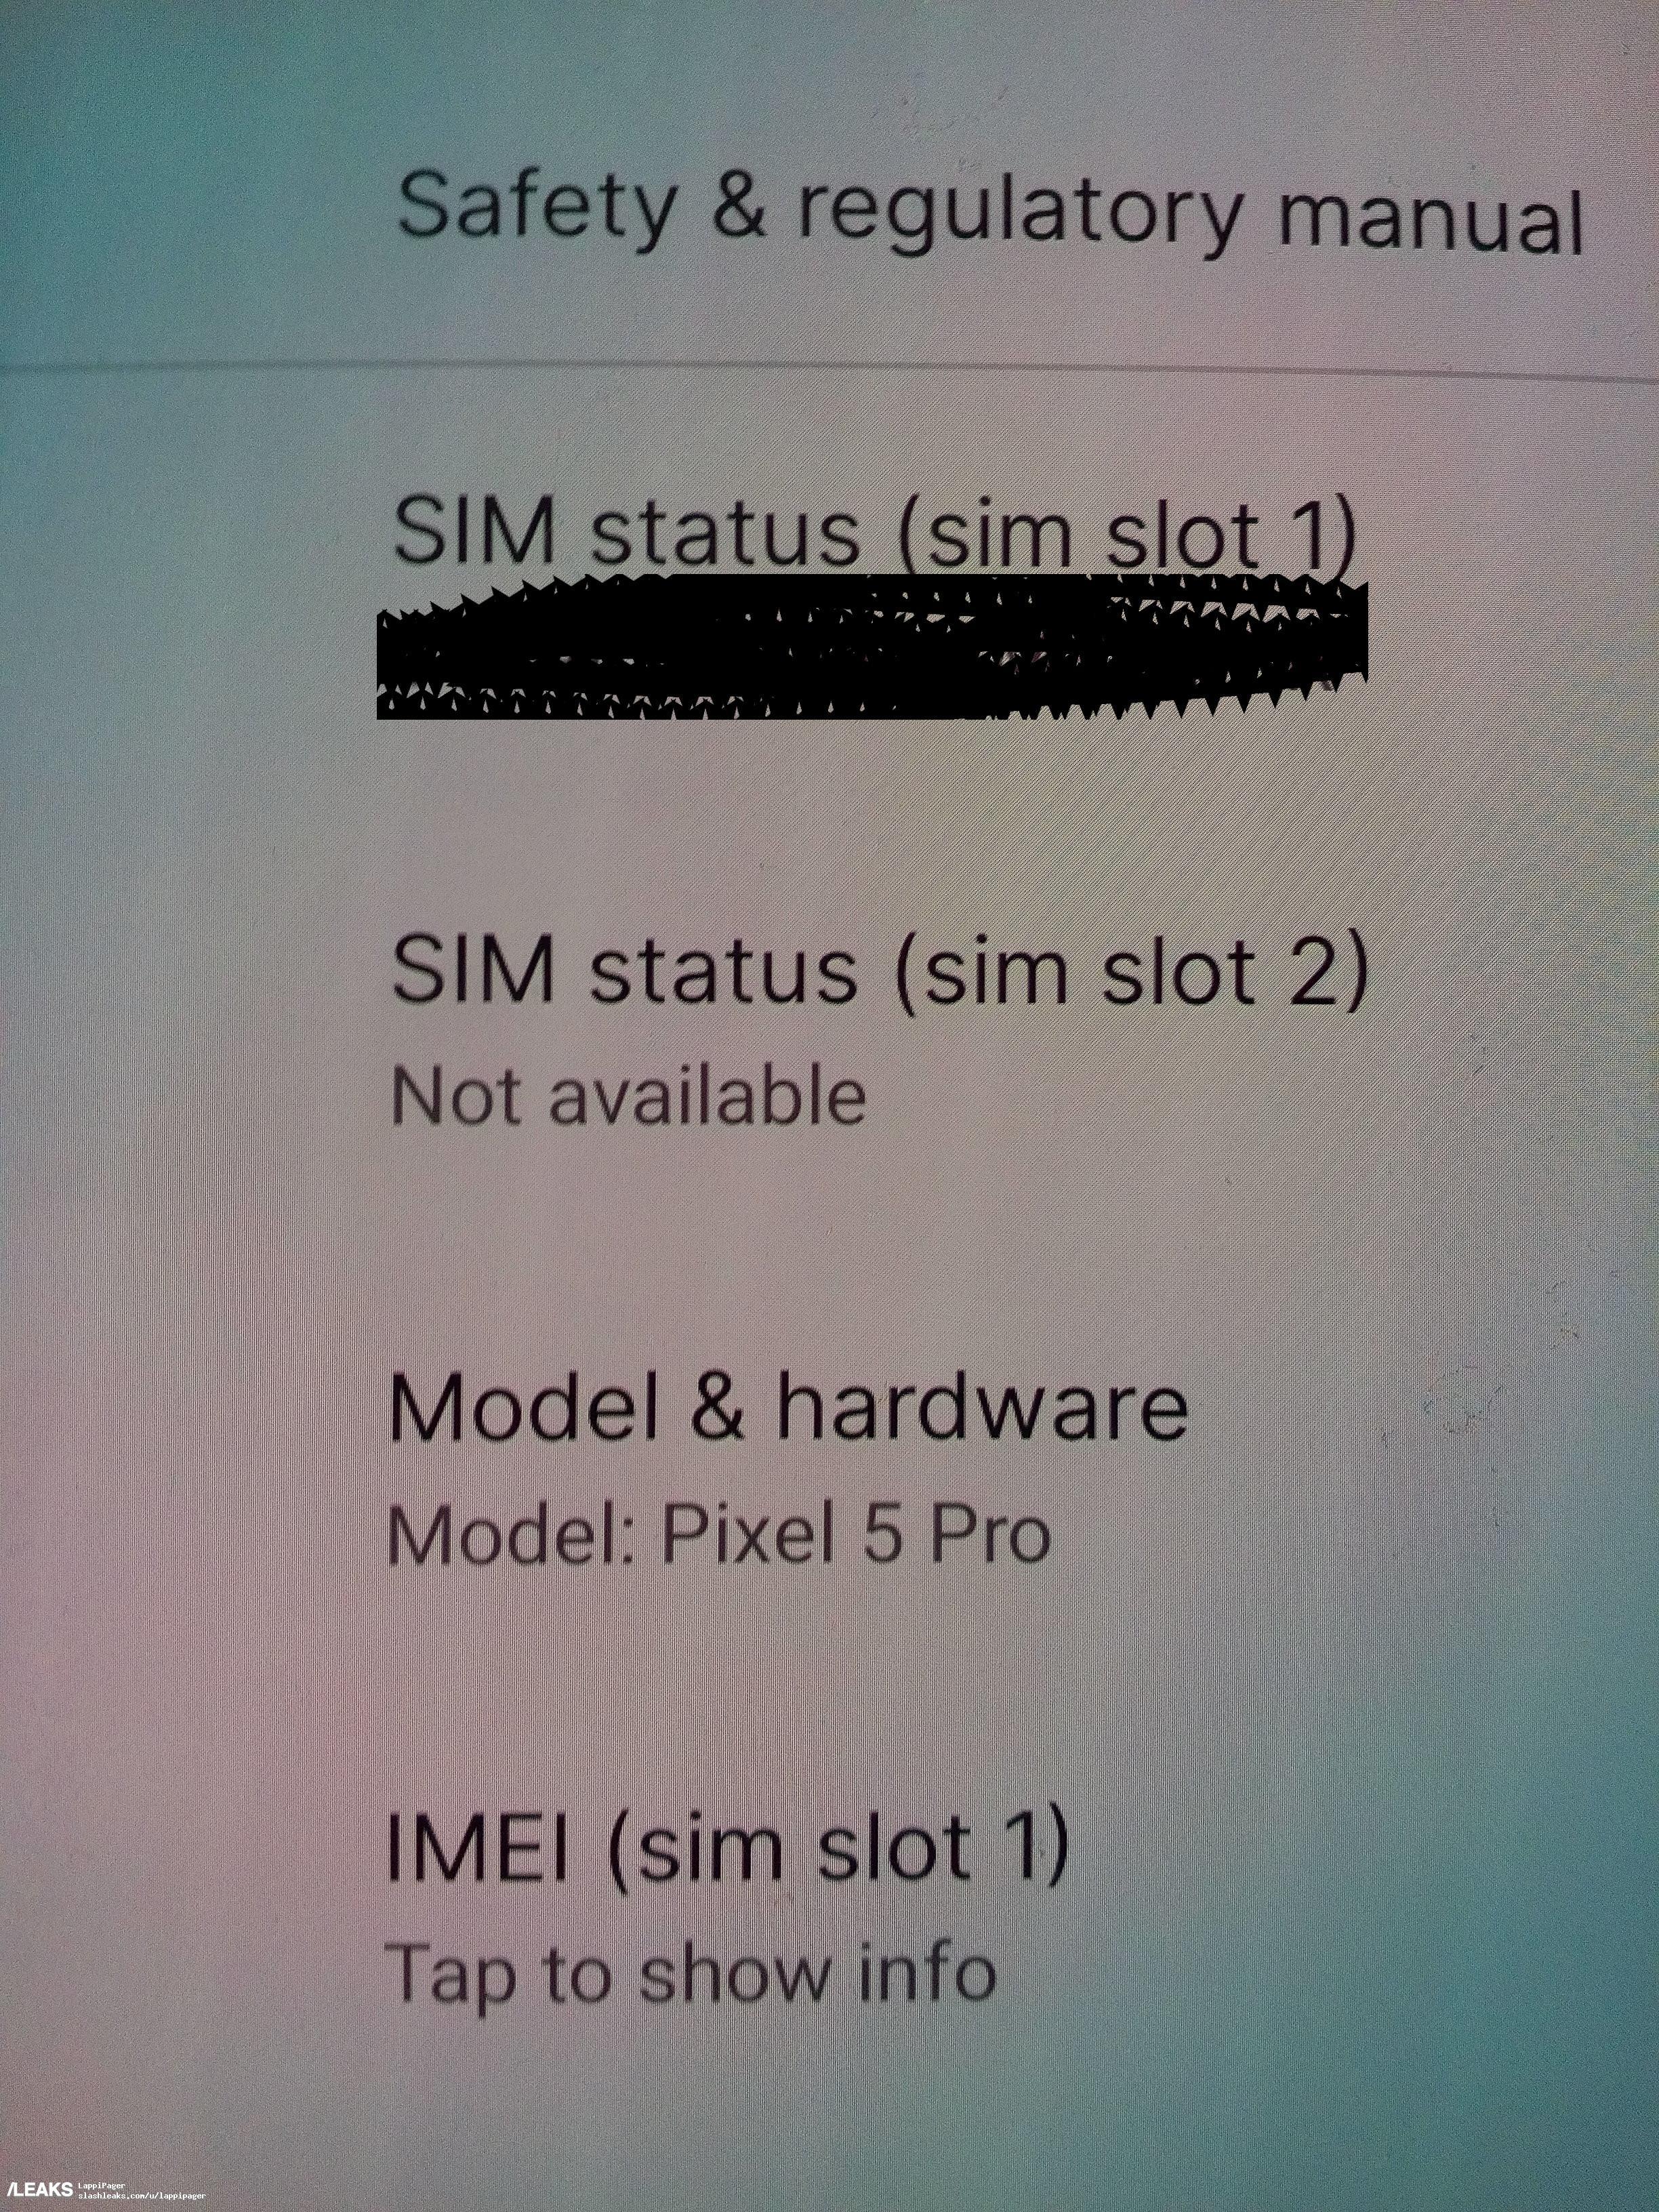 Pixel 5 Pro